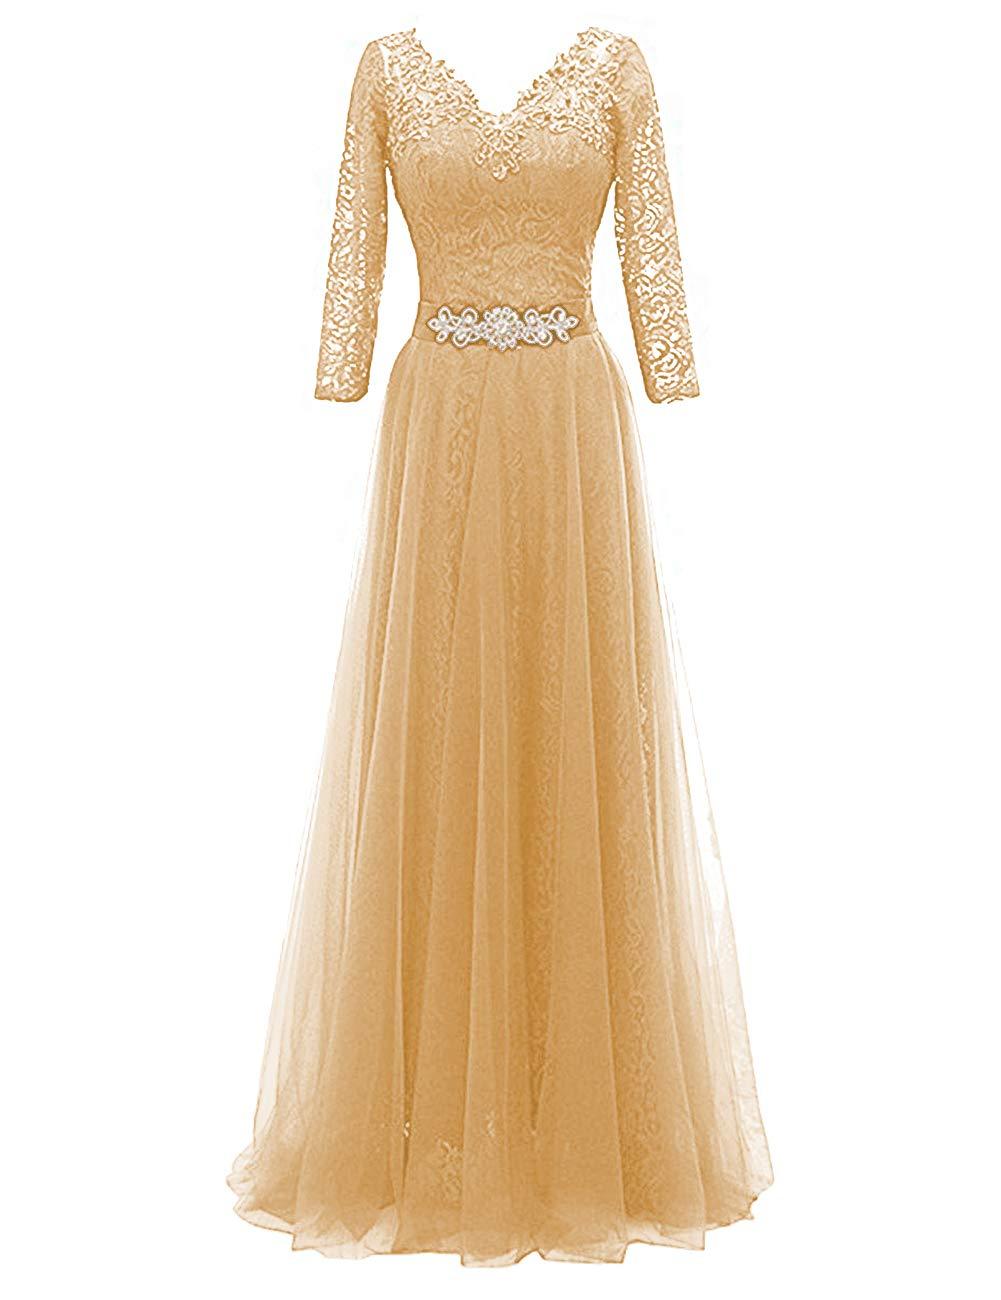 Mother of The Bride Dress V Neck Mother Dresses Long Formal Gowns Gold 28W